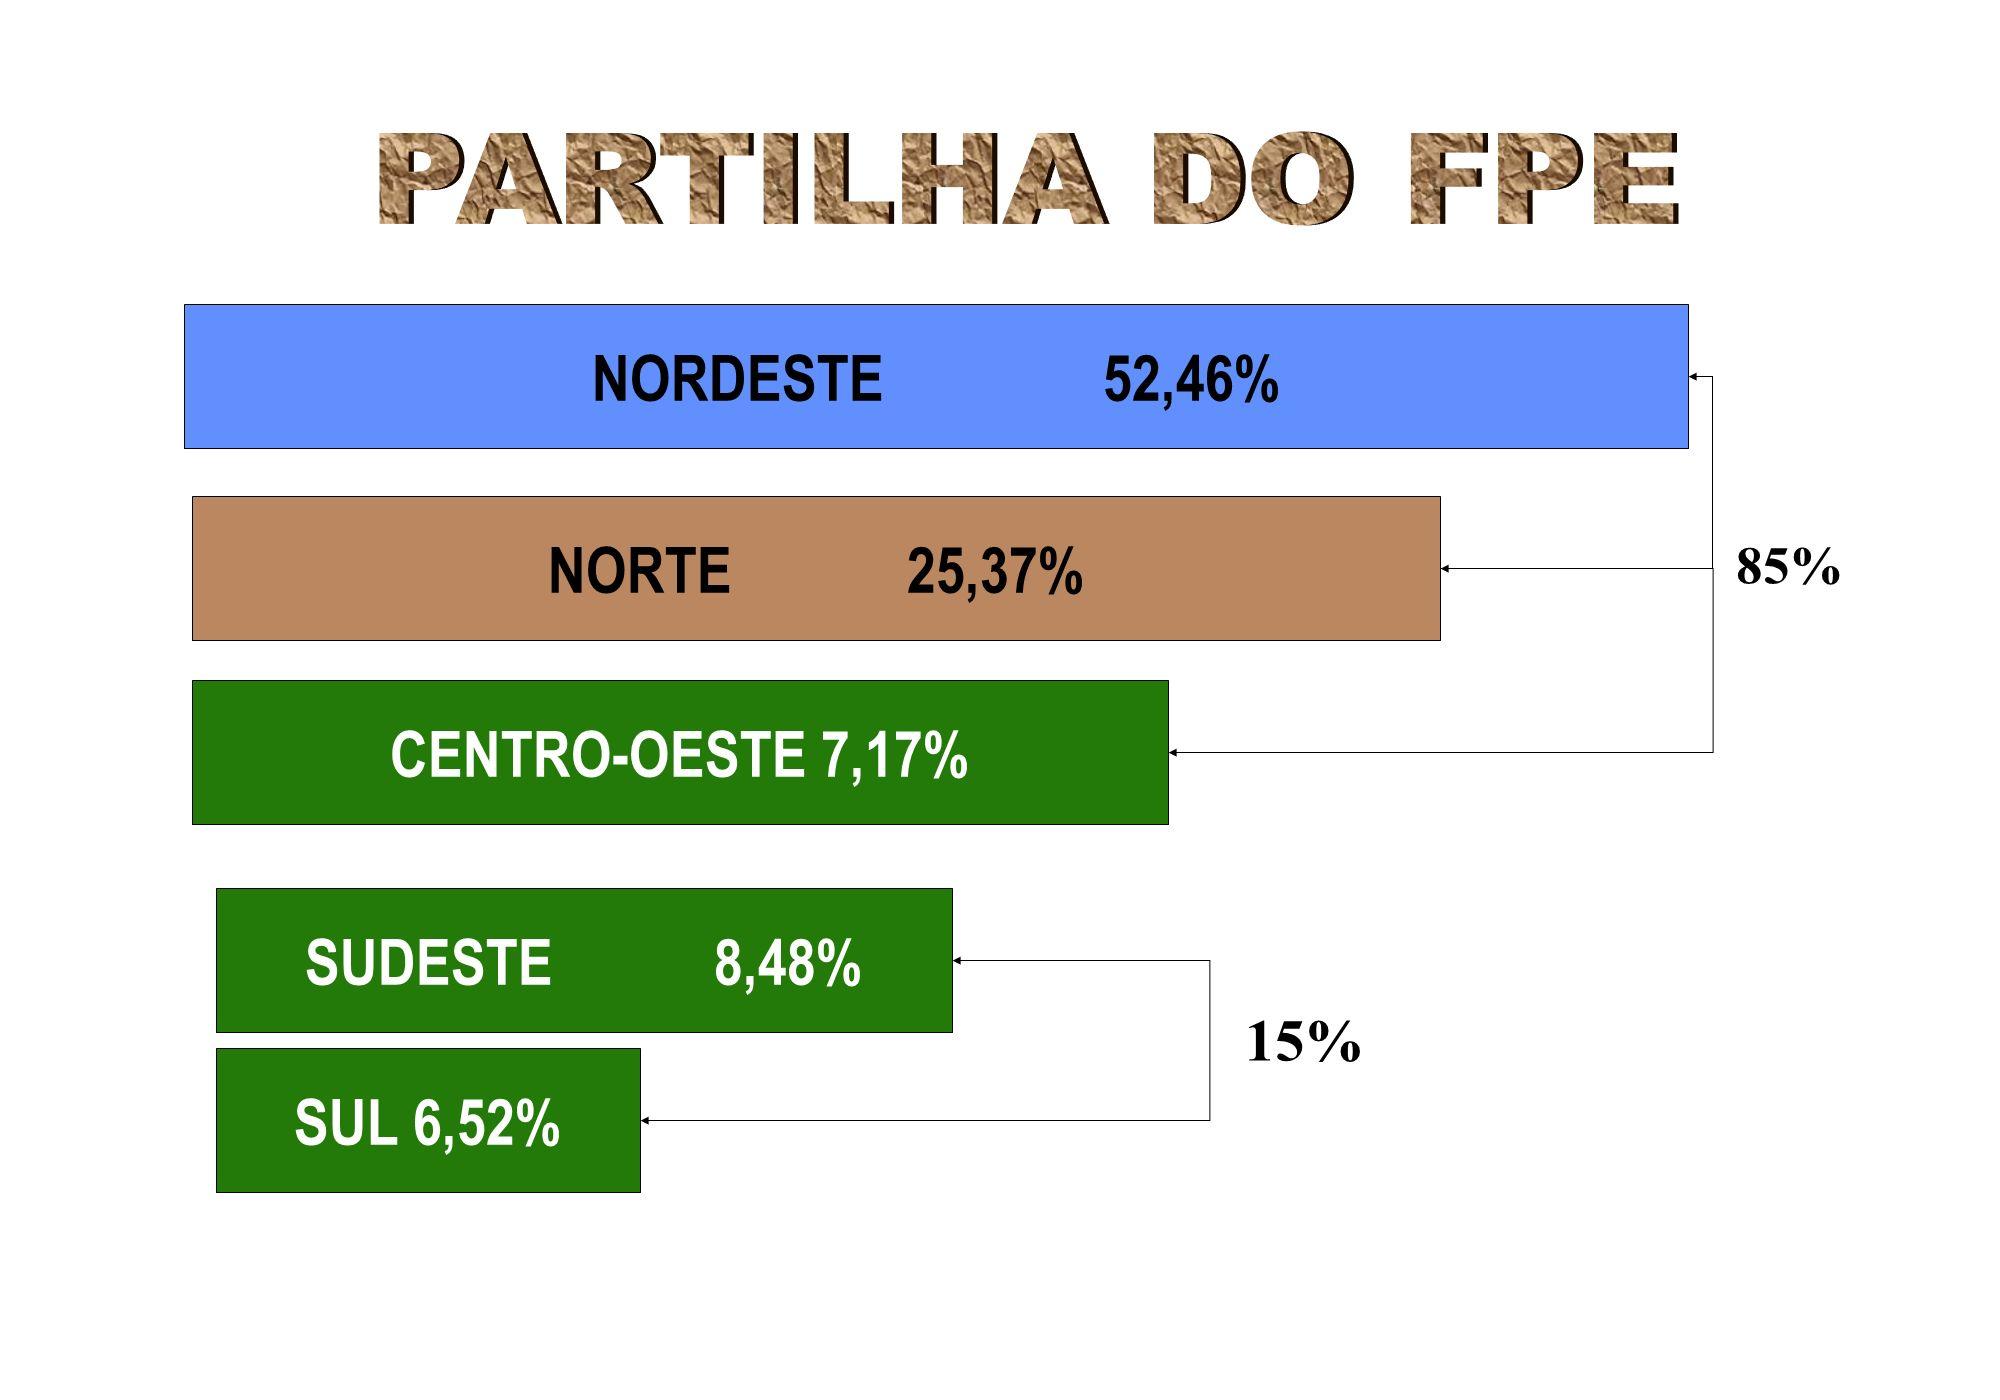 NORDESTE 52,46% NORTE 25,37% CENTRO-OESTE 7,17% SUDESTE 8,48% SUL 6,52% 85% 15%